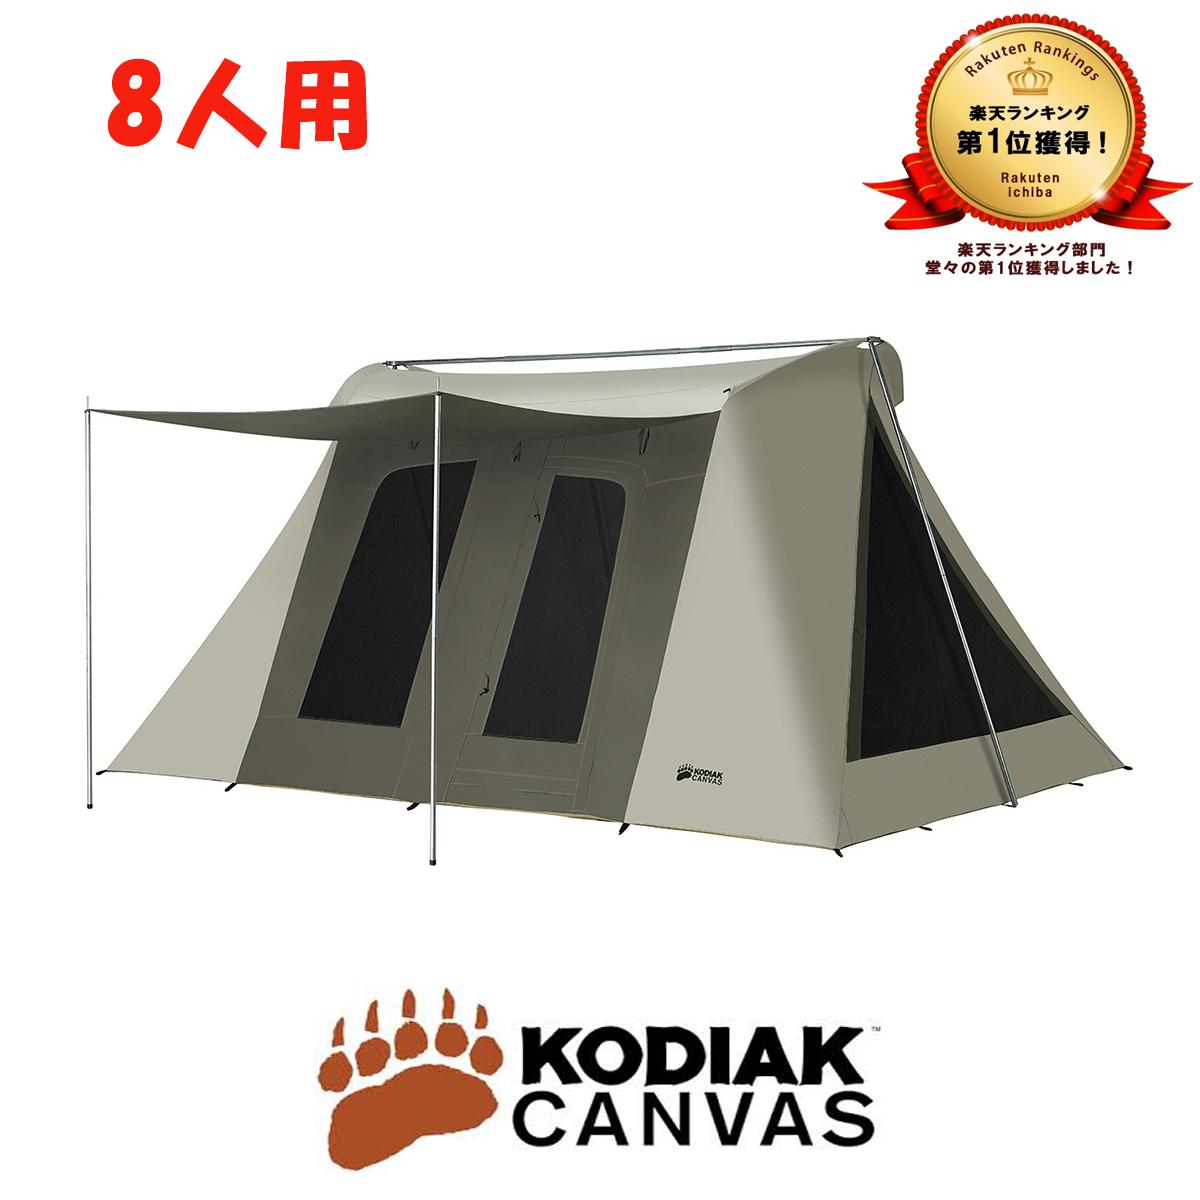 KODIAK CANVAS 8人用 Flex-Bow VX コディアック キャンバス コディアック カンバス テント コットンテント アウトドア キャンプ 防水 ファミリー グランピング おしゃれ 家族 大型